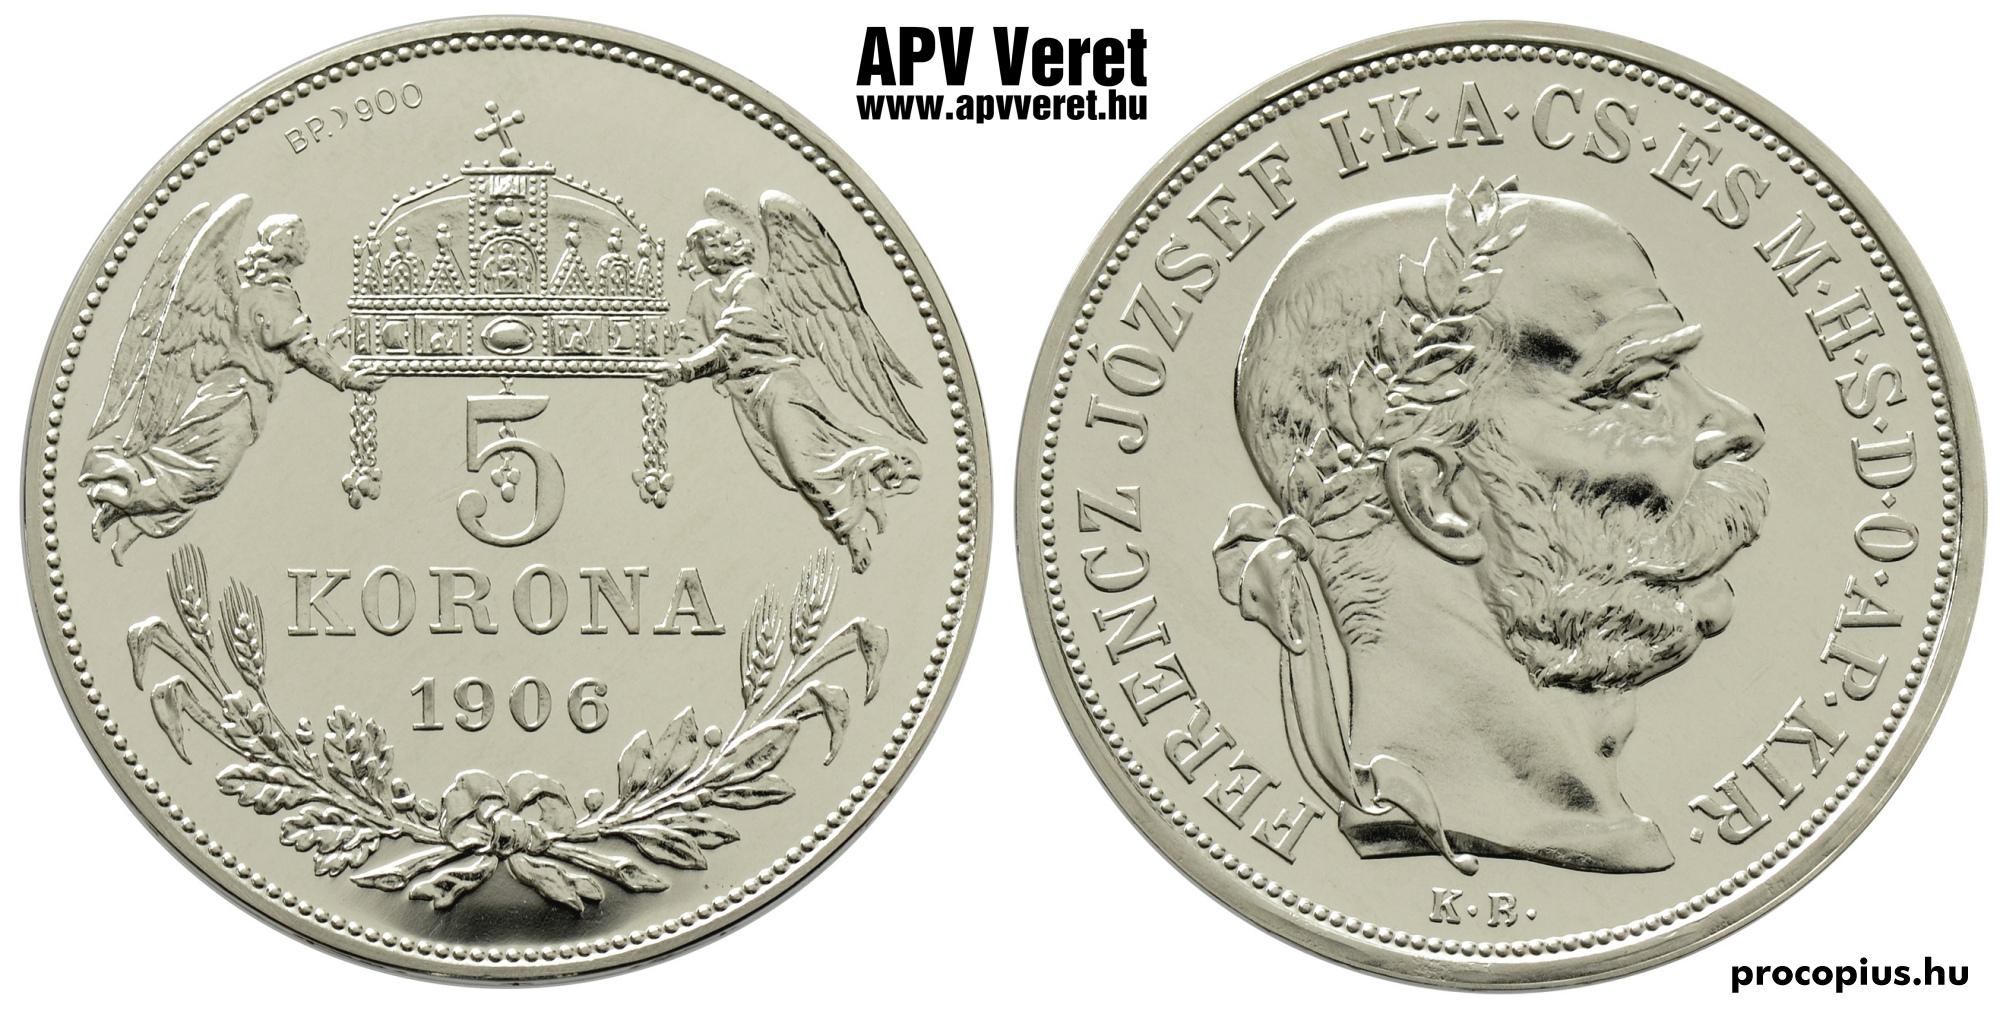 http://www.apvveret.hu/korona-penzvero-utanveret/www_apvveret_hu_ezust_jelolt_1906_5_korona_penzvero-utanveret.jpg